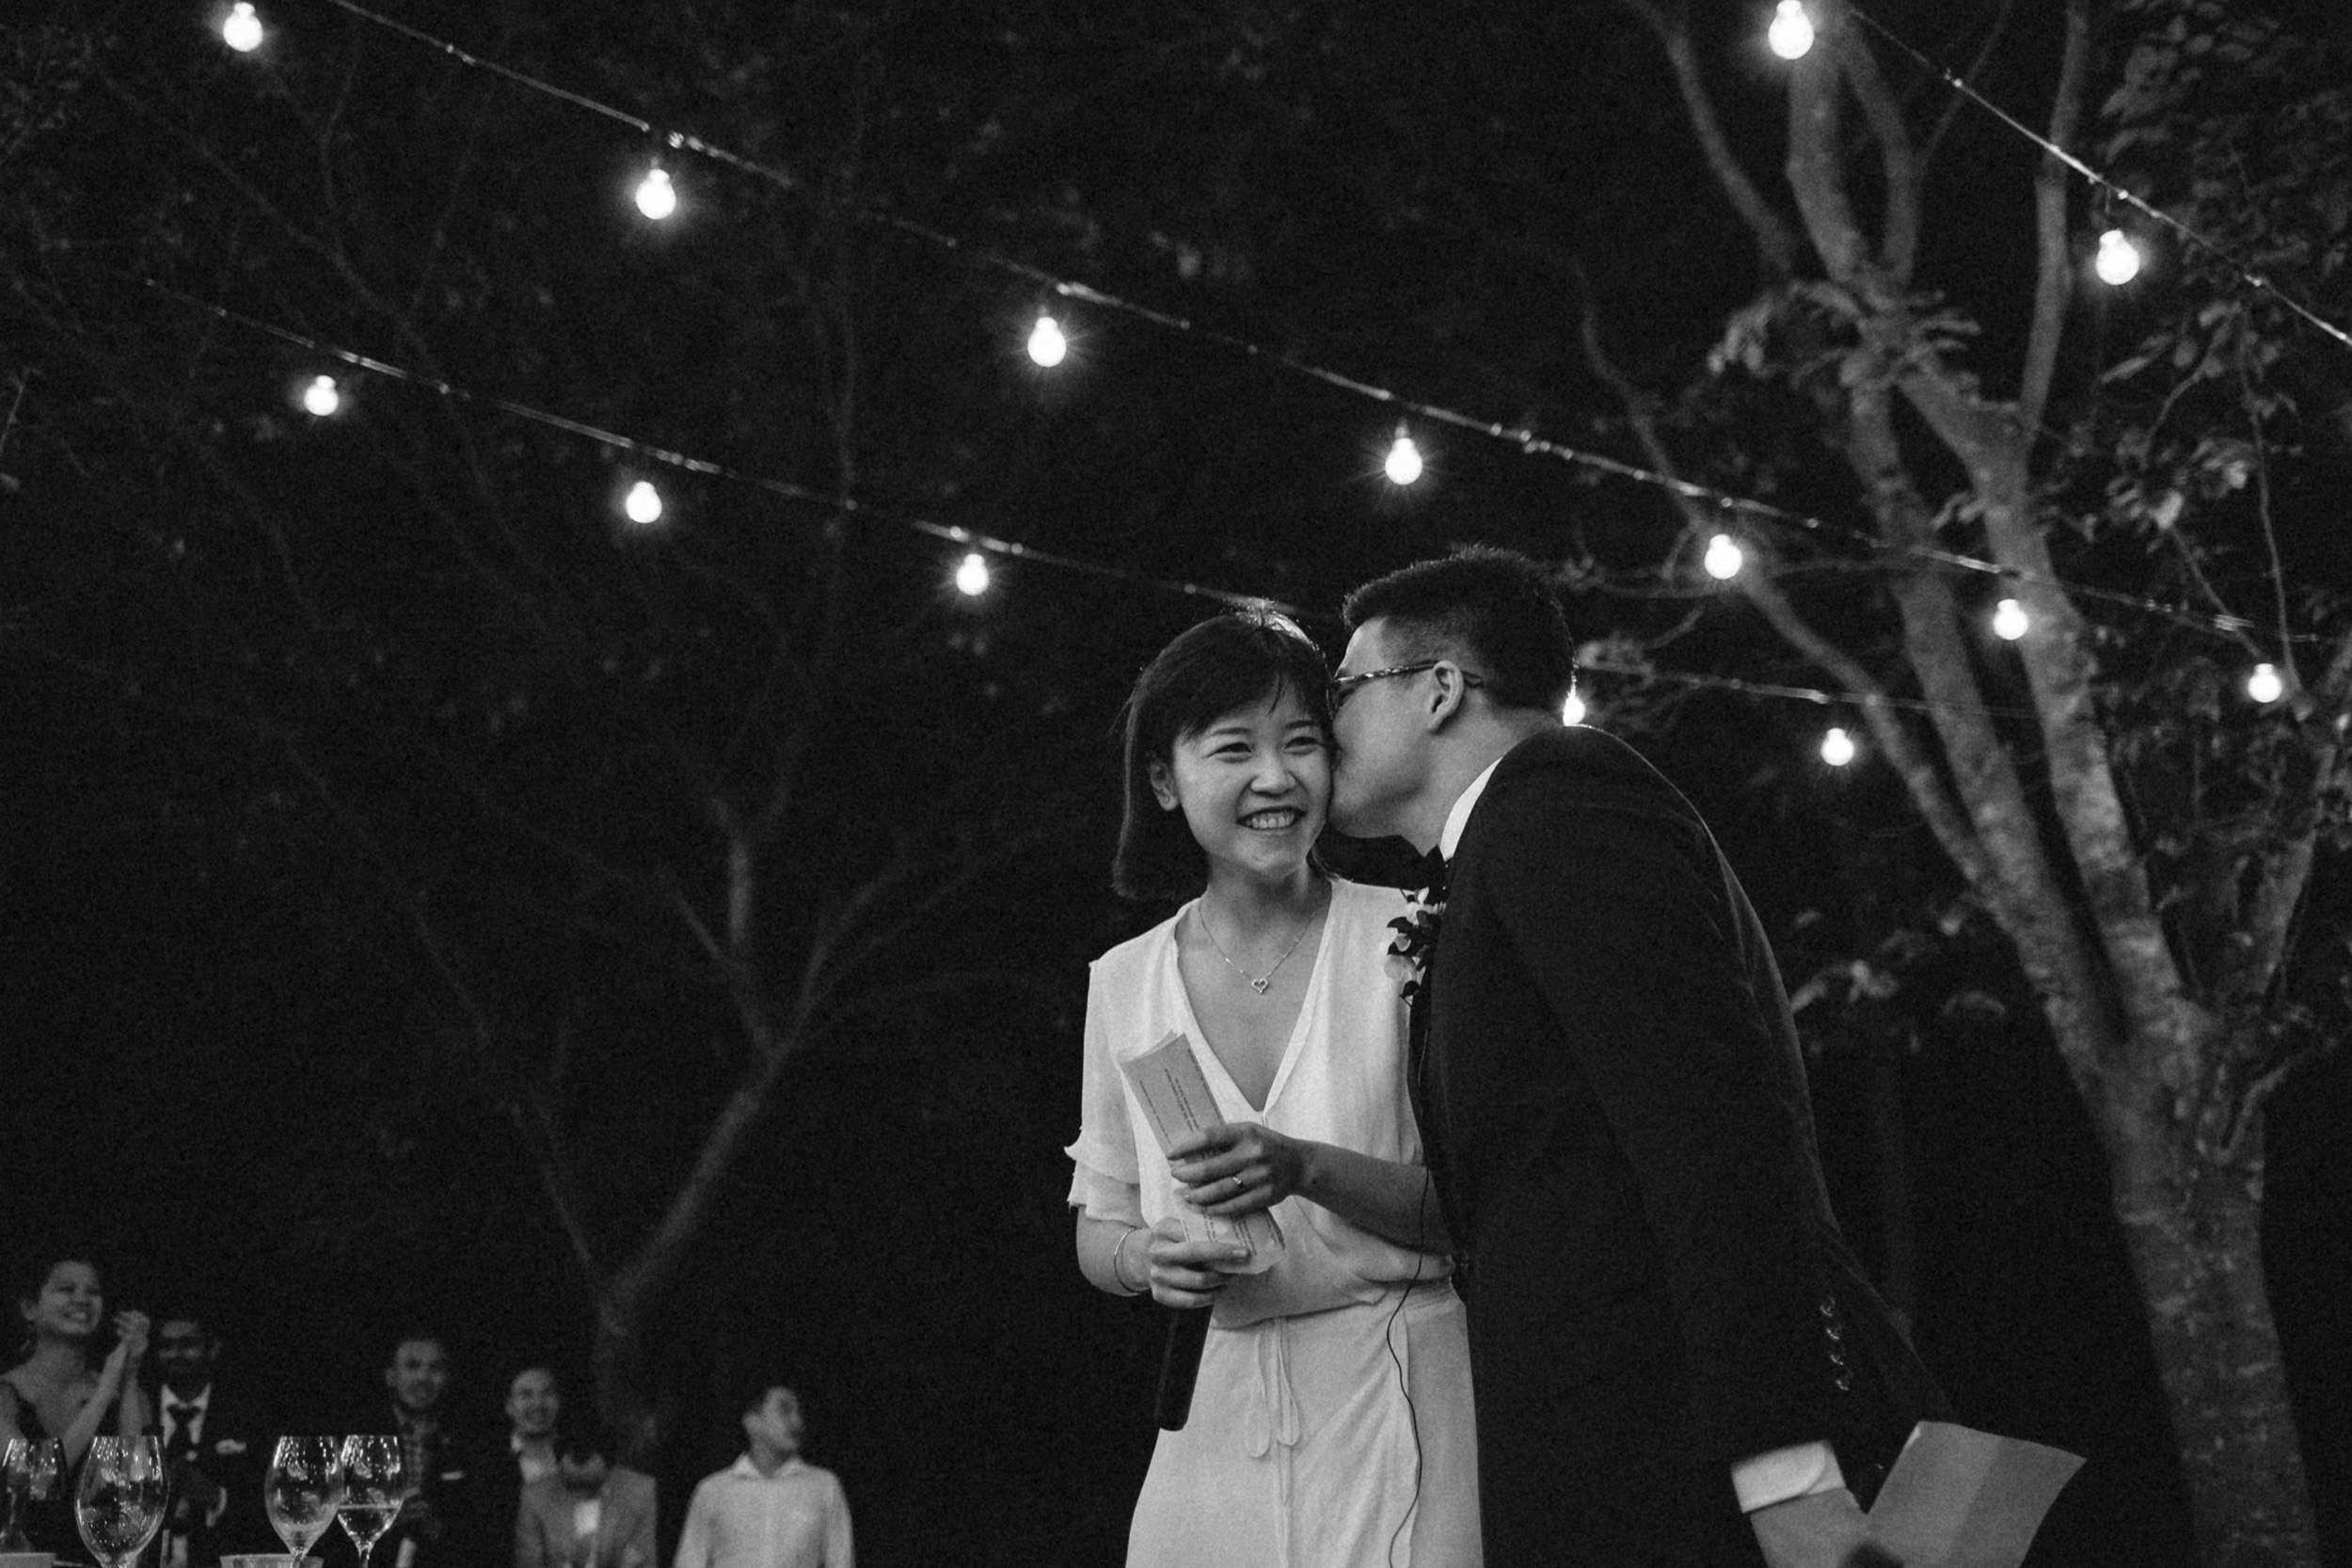 singapore-wedding-photographer-photography-wmt2017-066.jpg